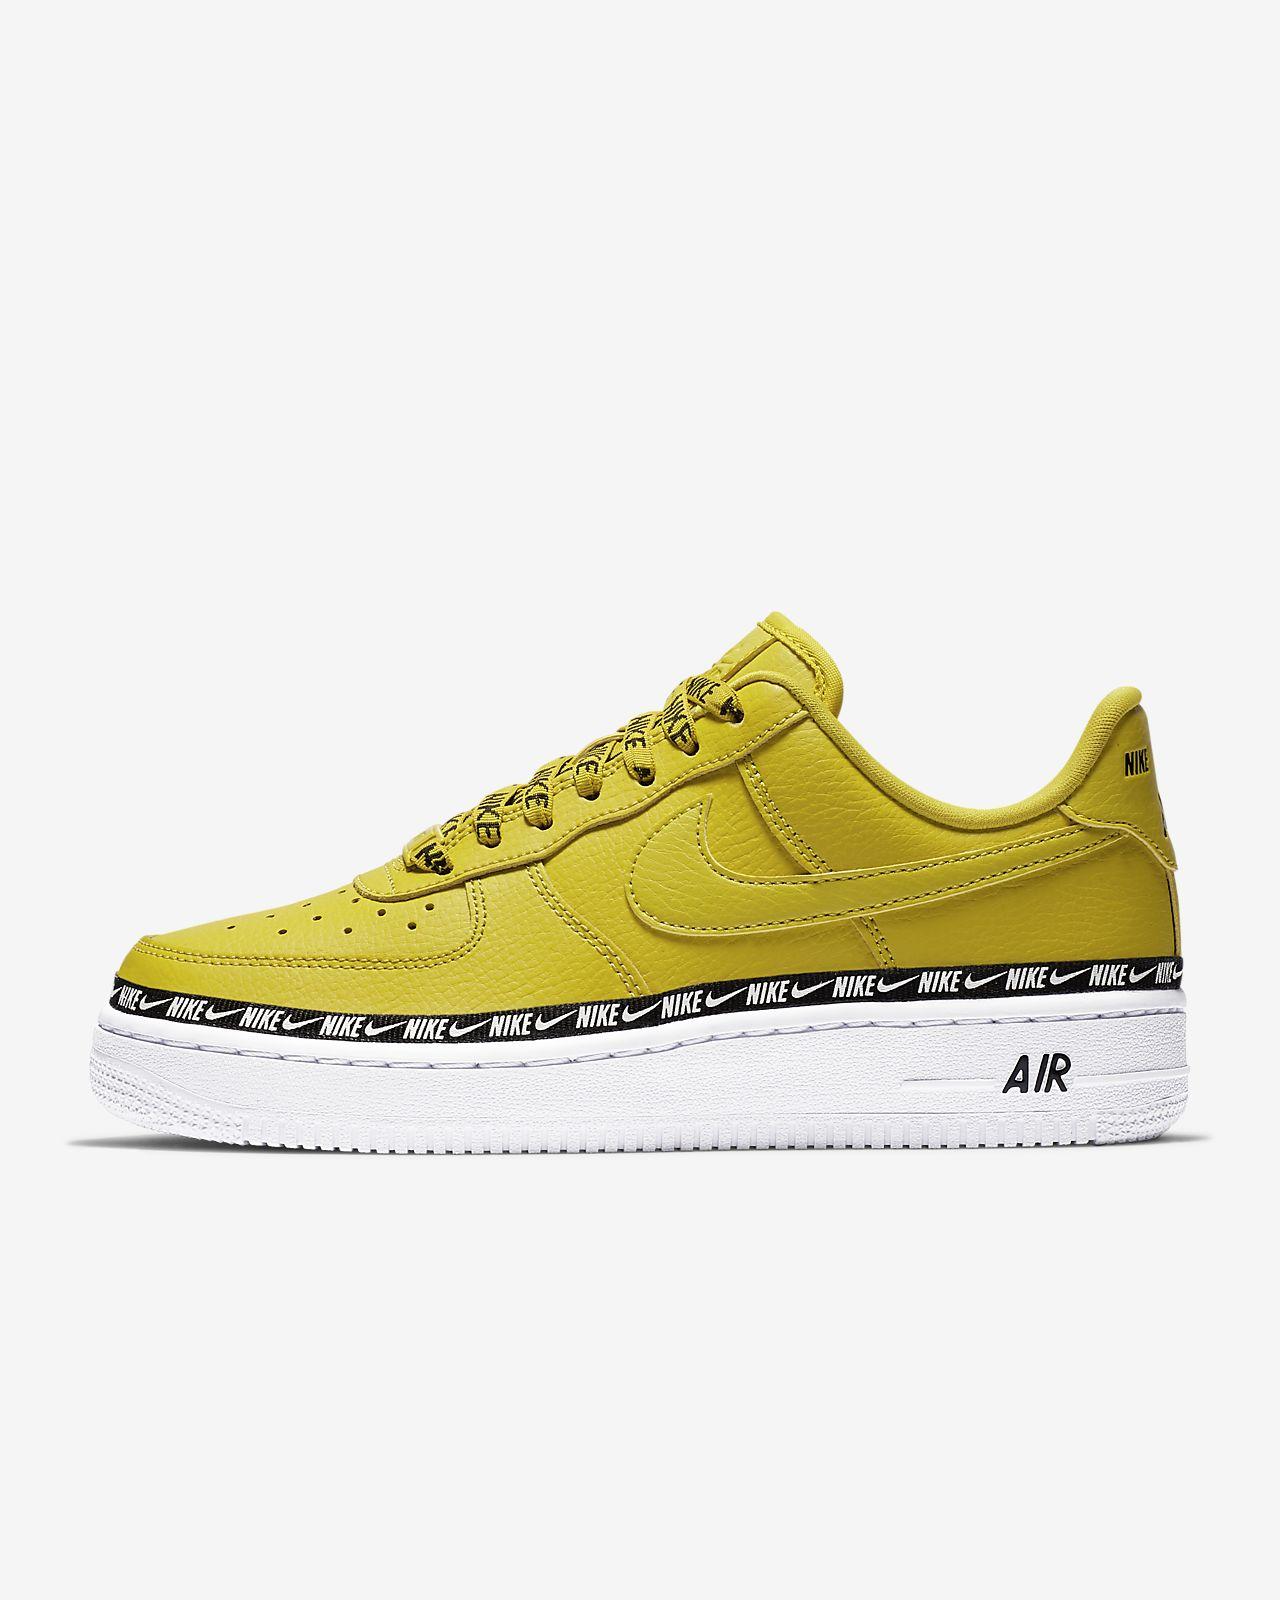 Nike Air Force 1 '07 SE Premium Women's Shoe